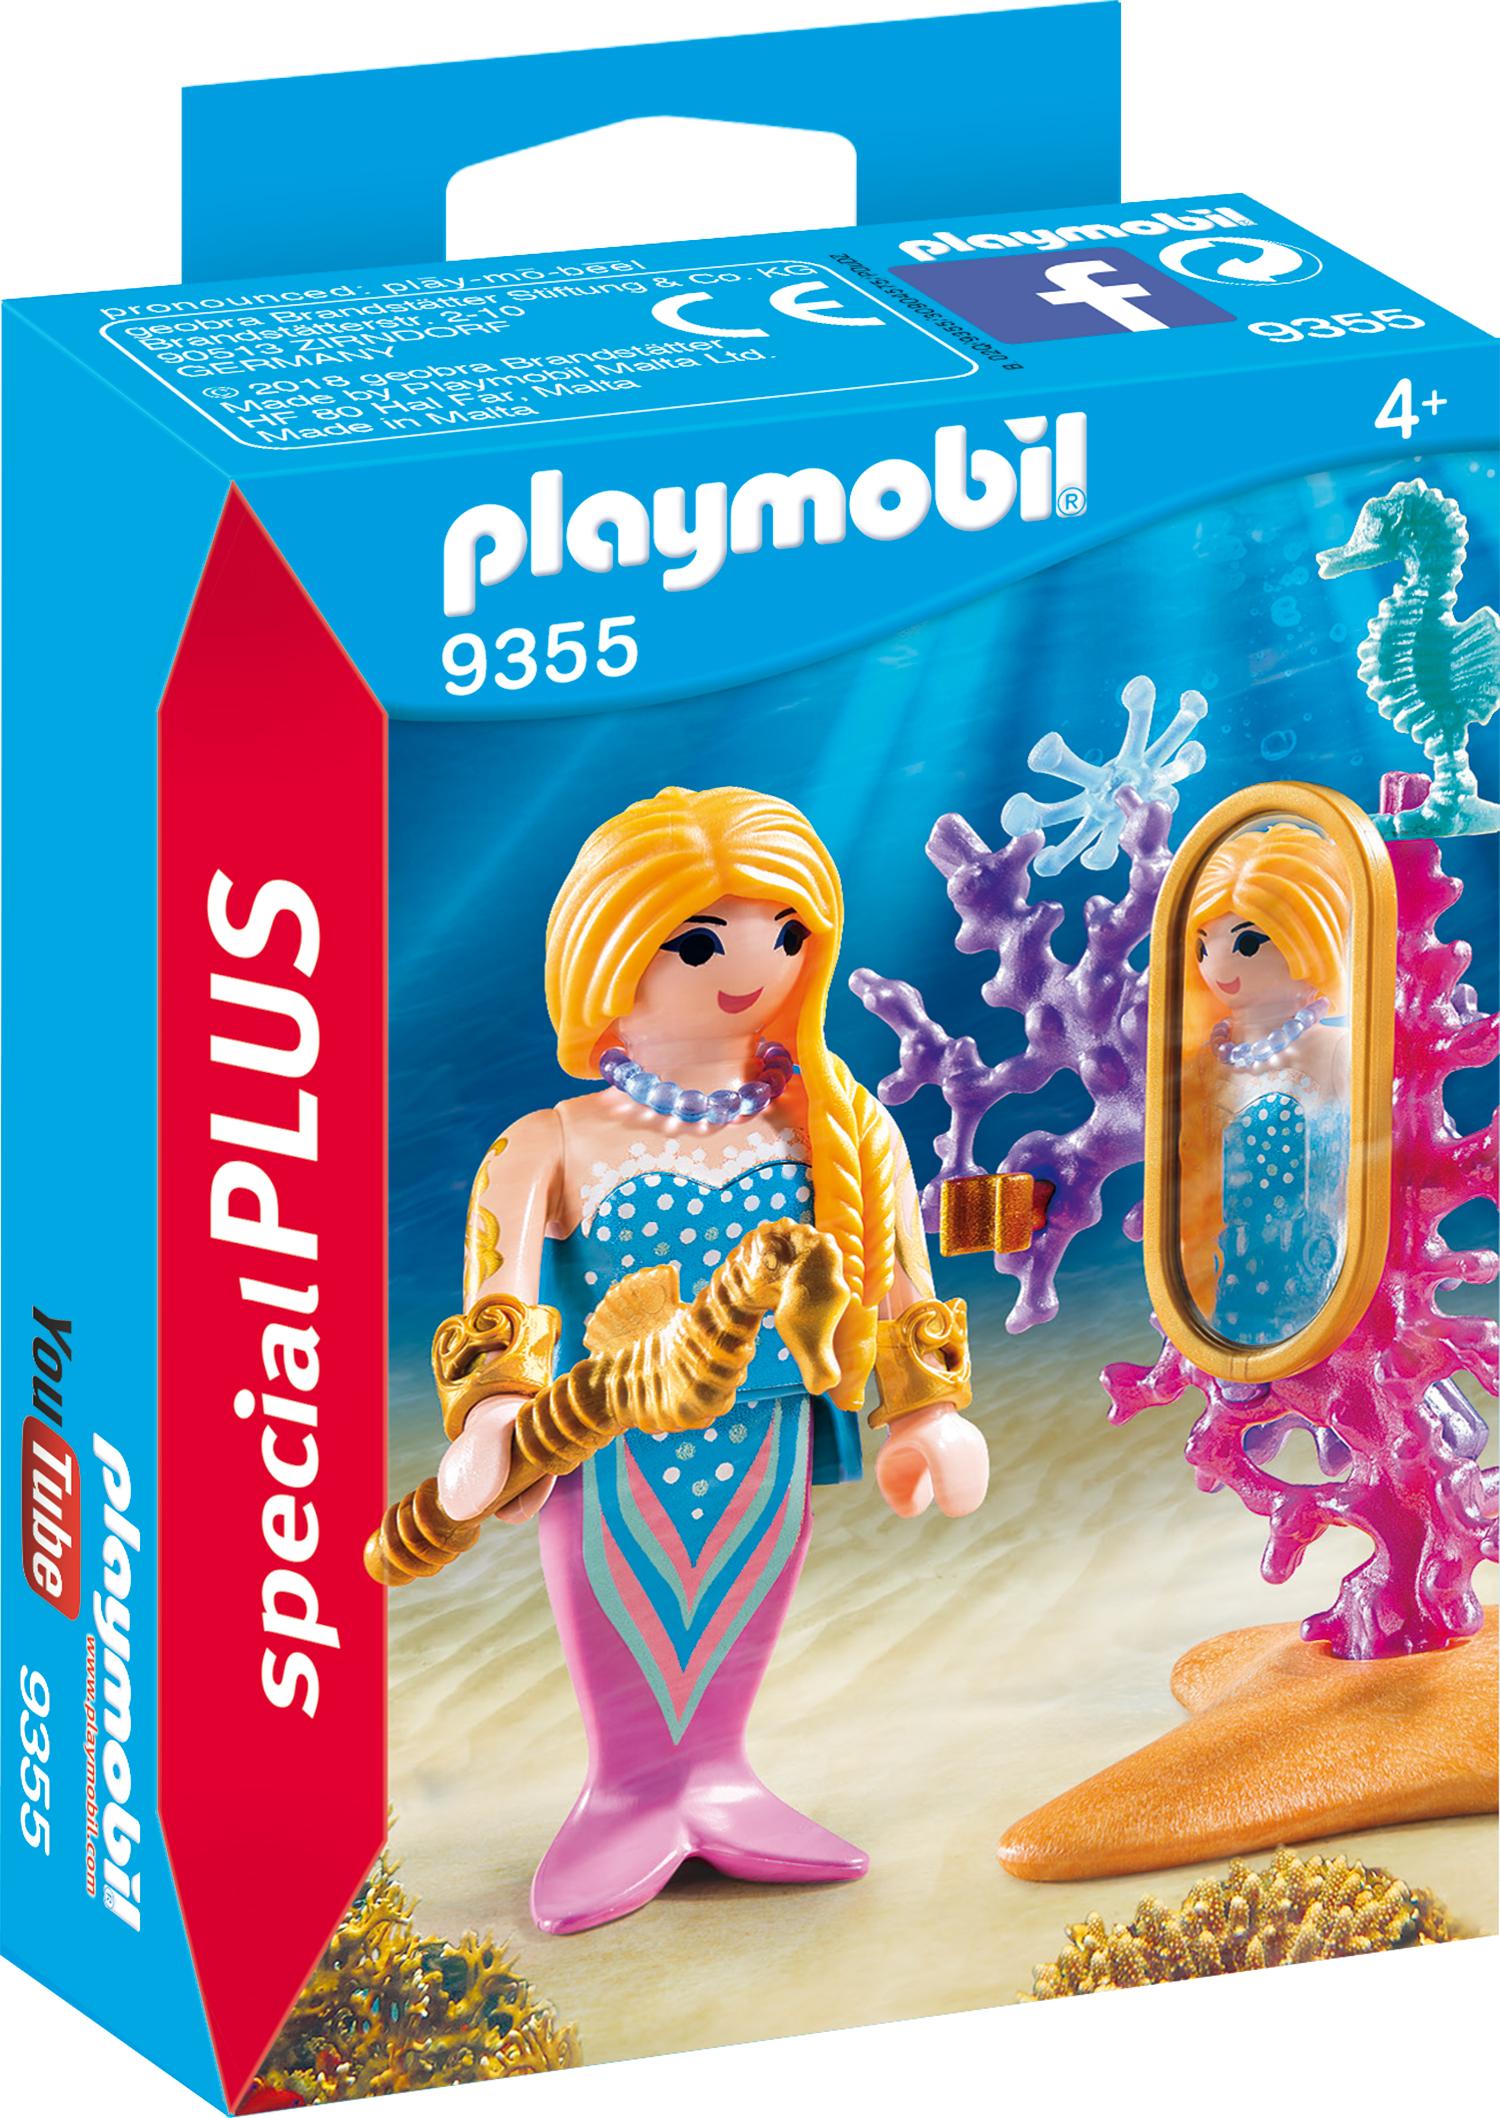 Figurina sirena playmobil